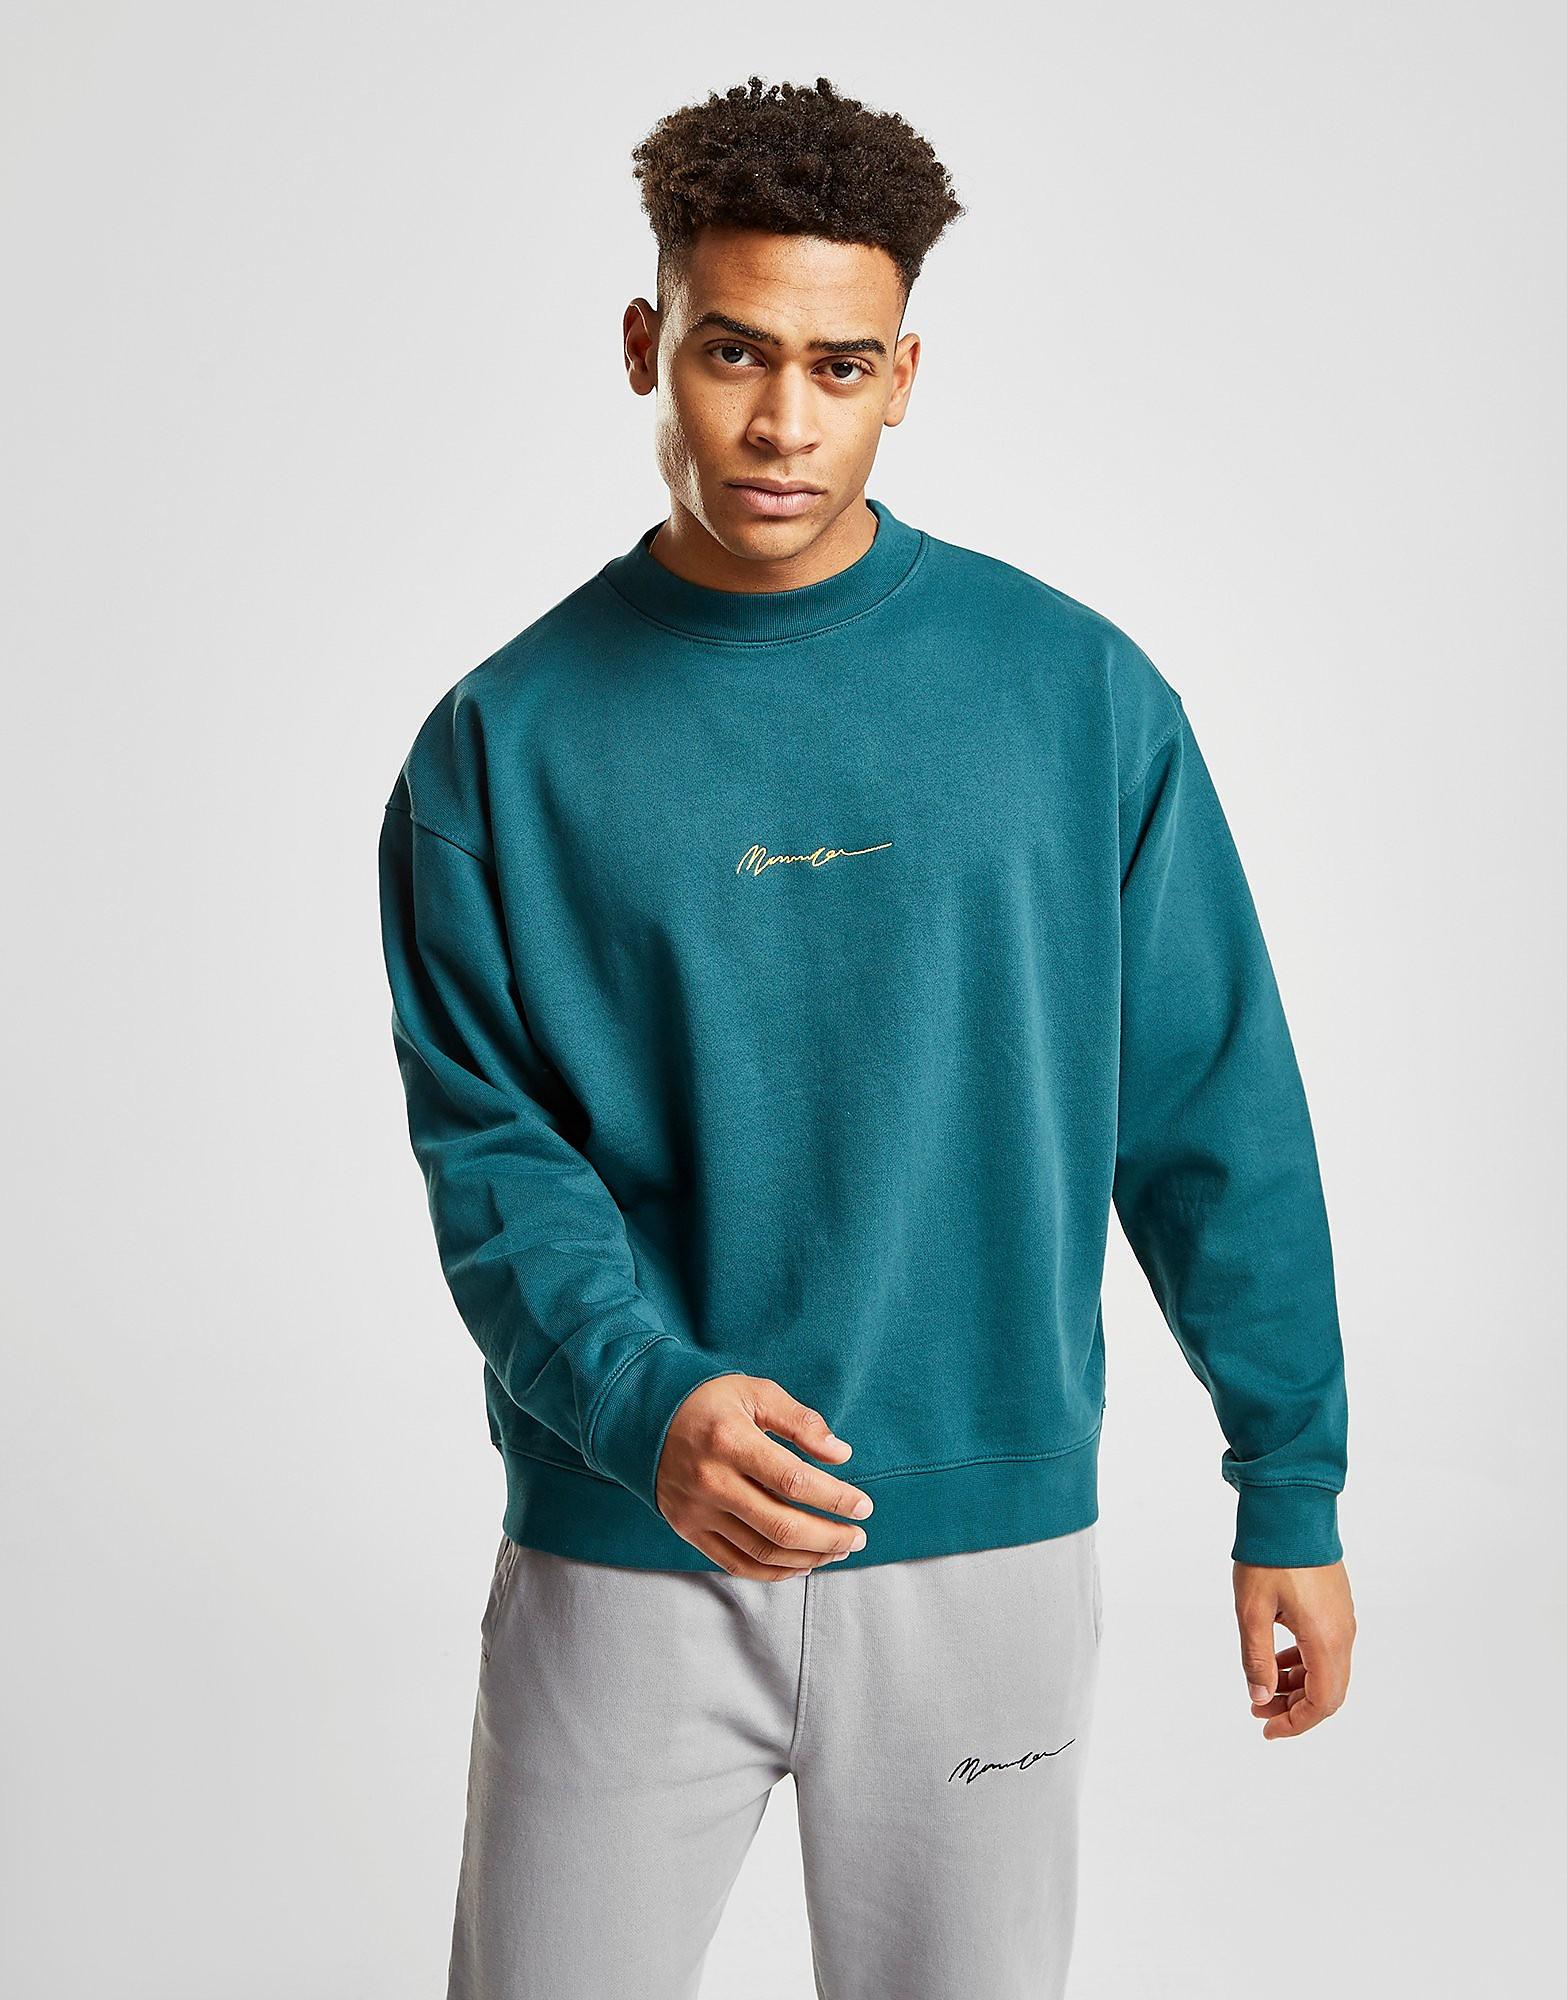 Mennace Washed Signature Sweatshirt Heren - Teal/Yellow - Heren